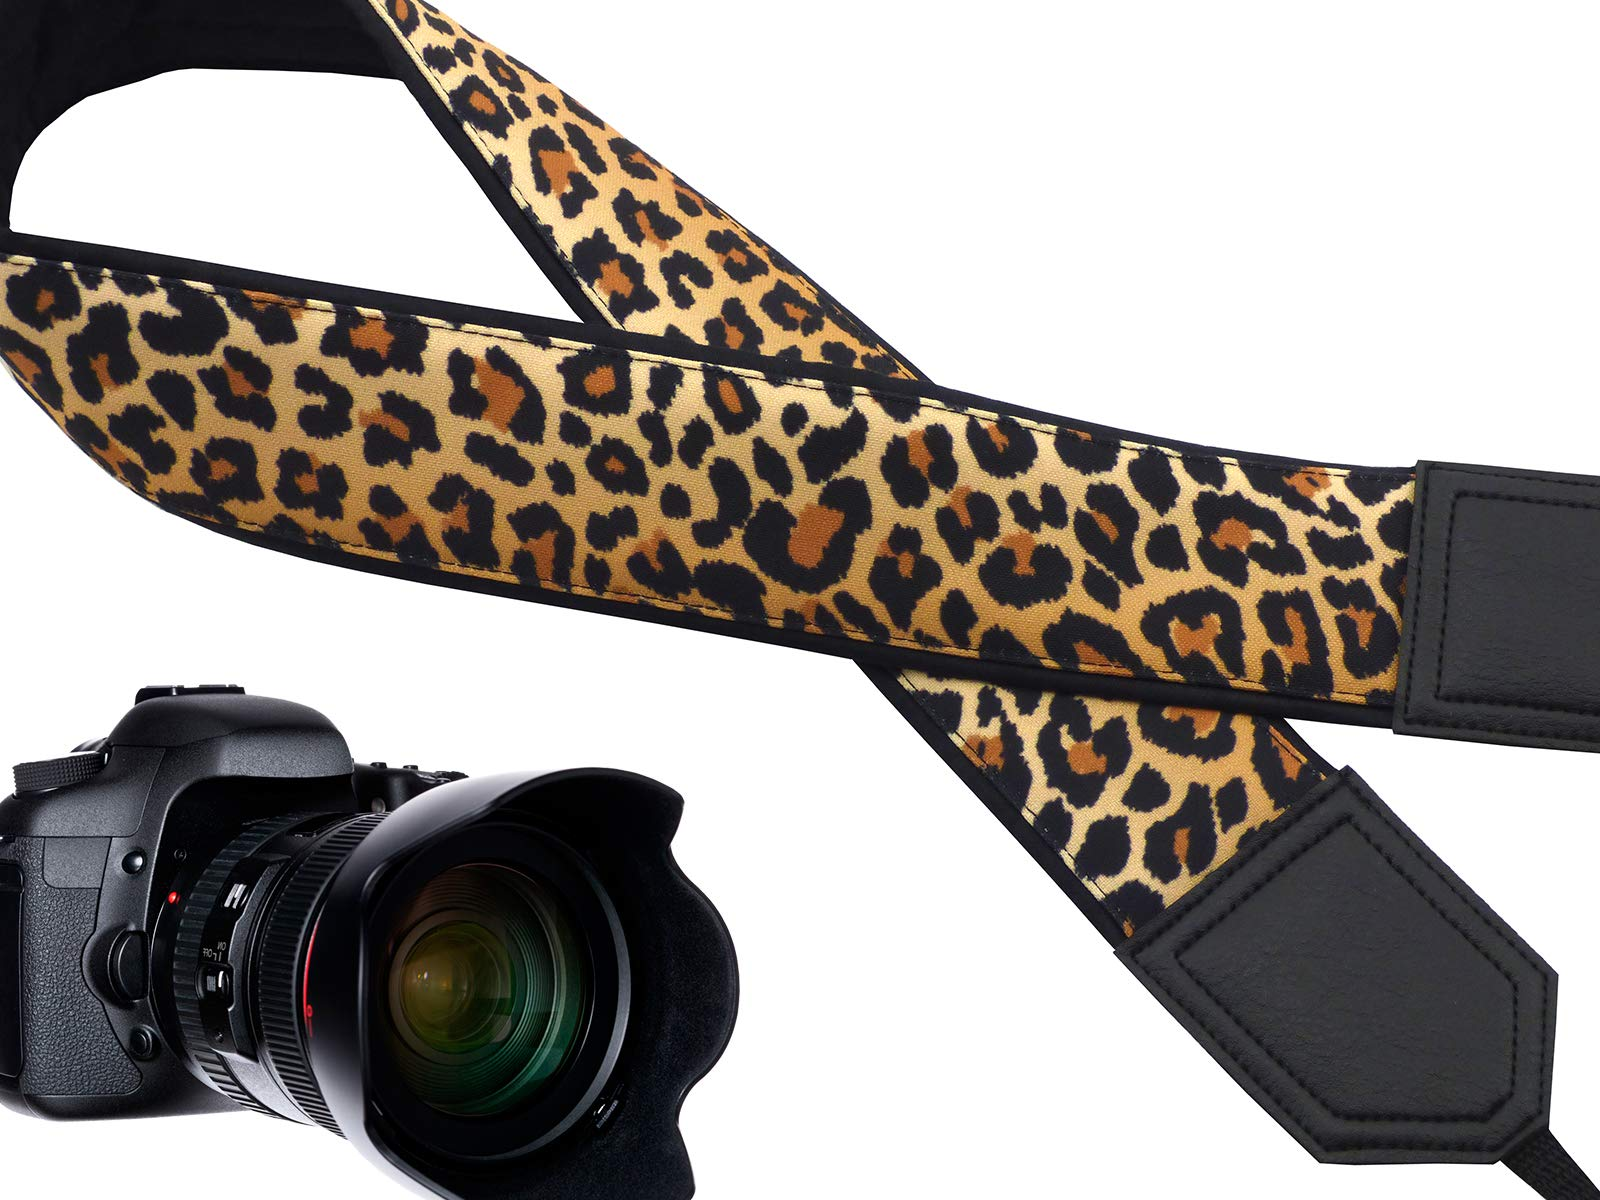 Leopard Camera Strap Designed for Wild Animal Lovers Suitable for DSLR/SLR and Other Standard Cameras.